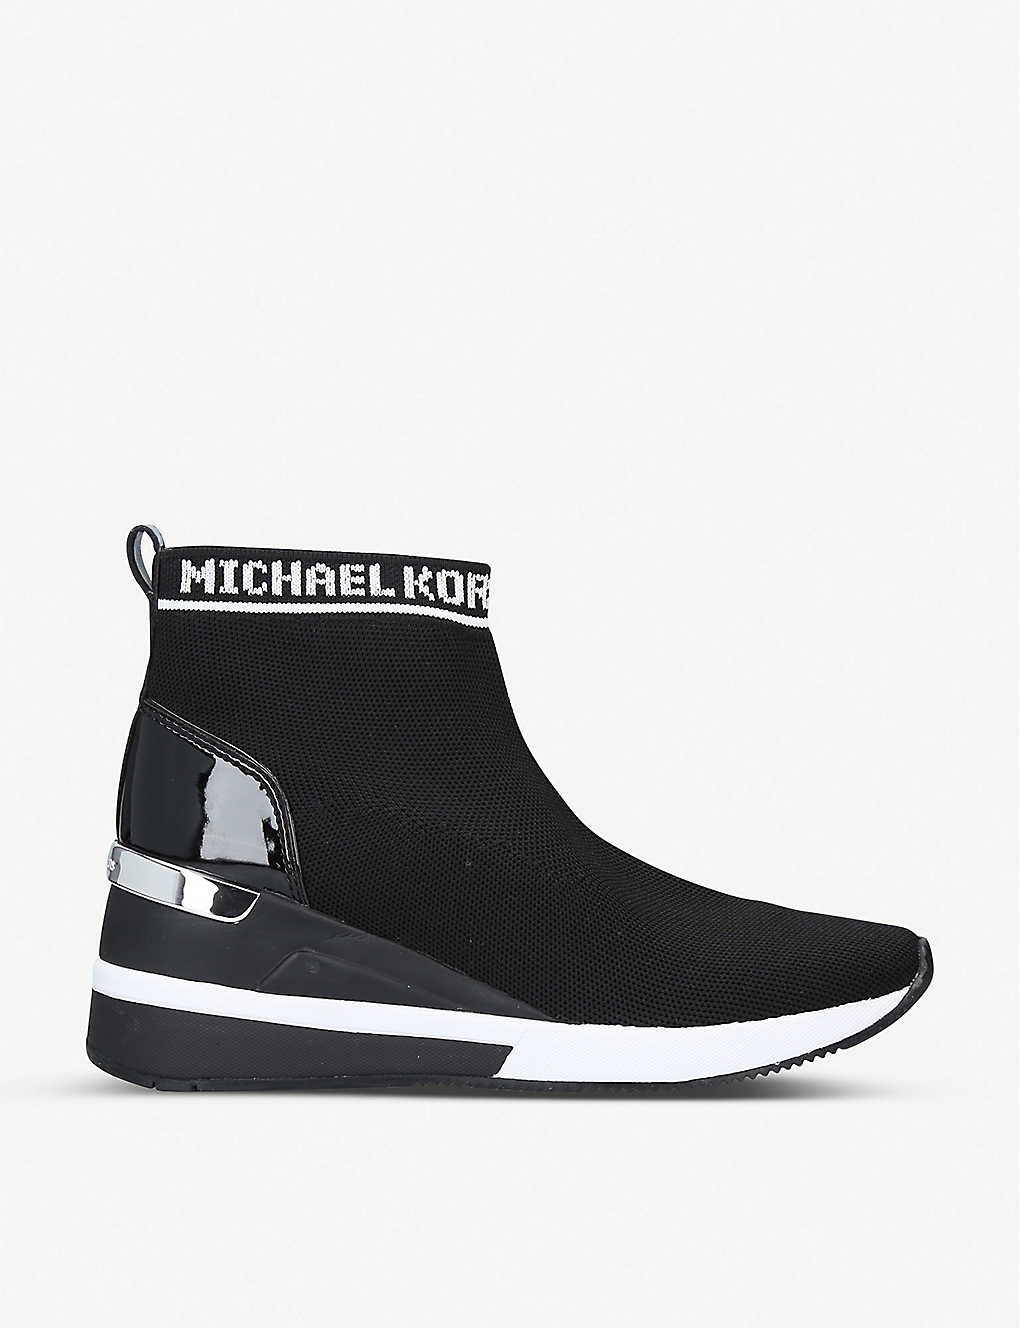 49a72bf69371 MICHAEL MICHAEL KORS - Skyler pull-on woven booties